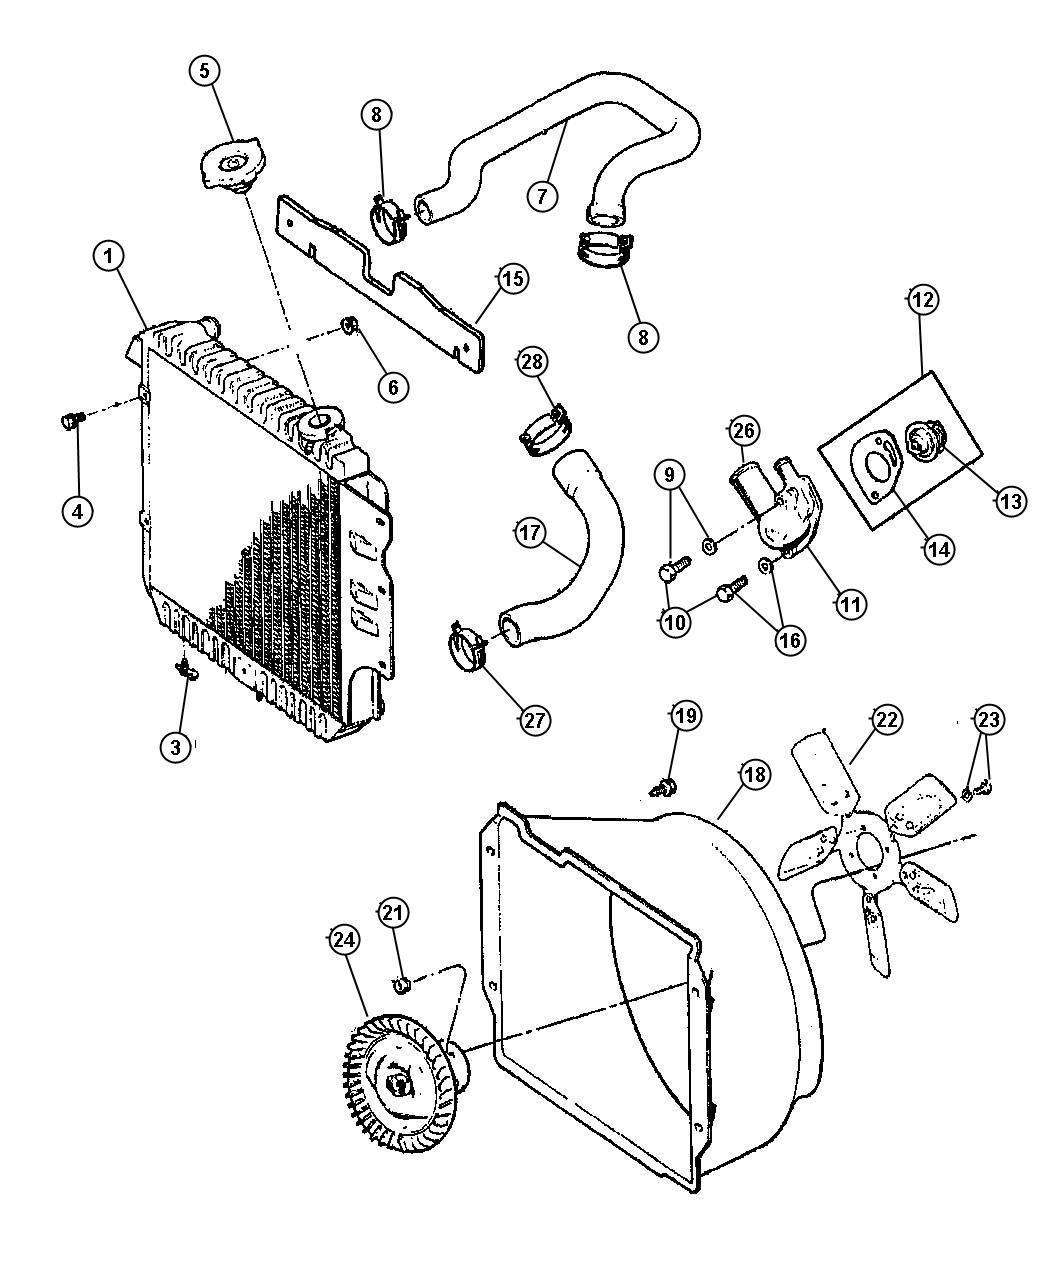 55037694ab mopar fan fan module cooling radiator. Black Bedroom Furniture Sets. Home Design Ideas